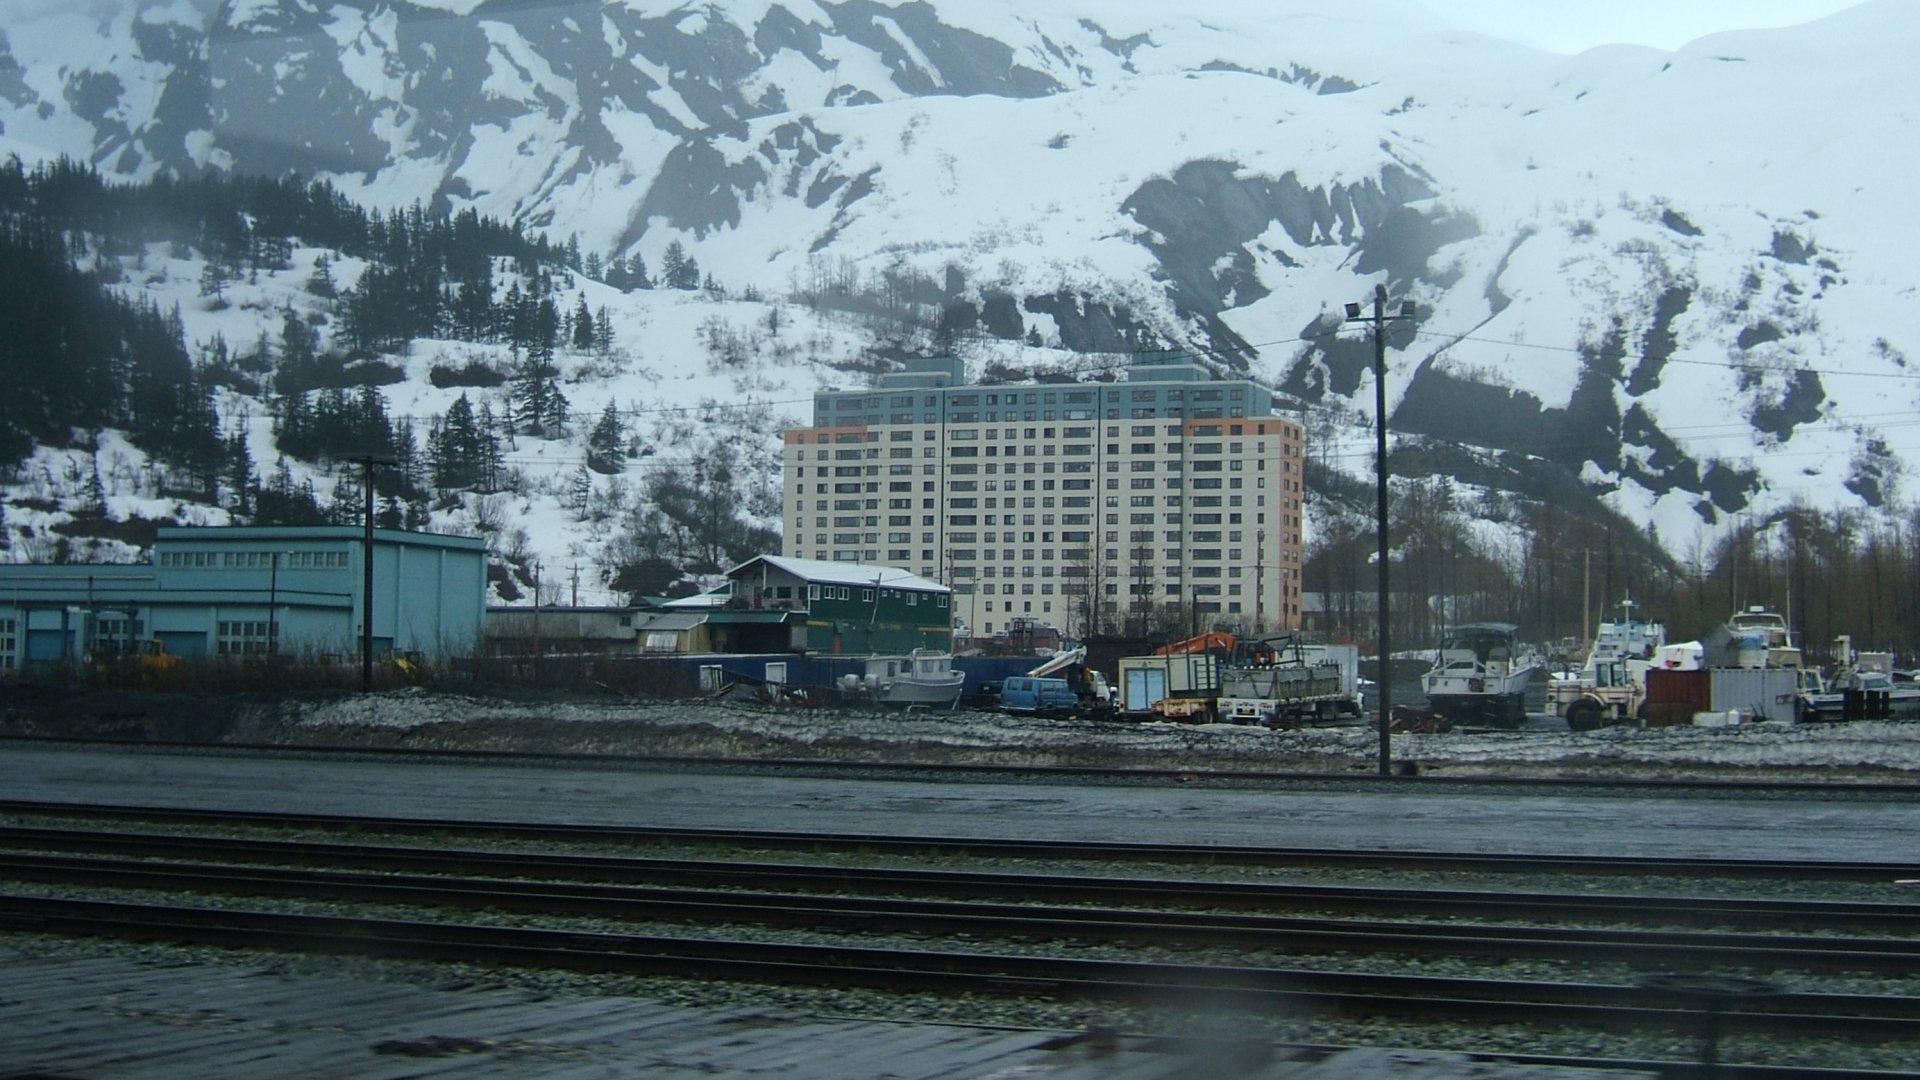 A Begich torony az alaszkai Whittierben